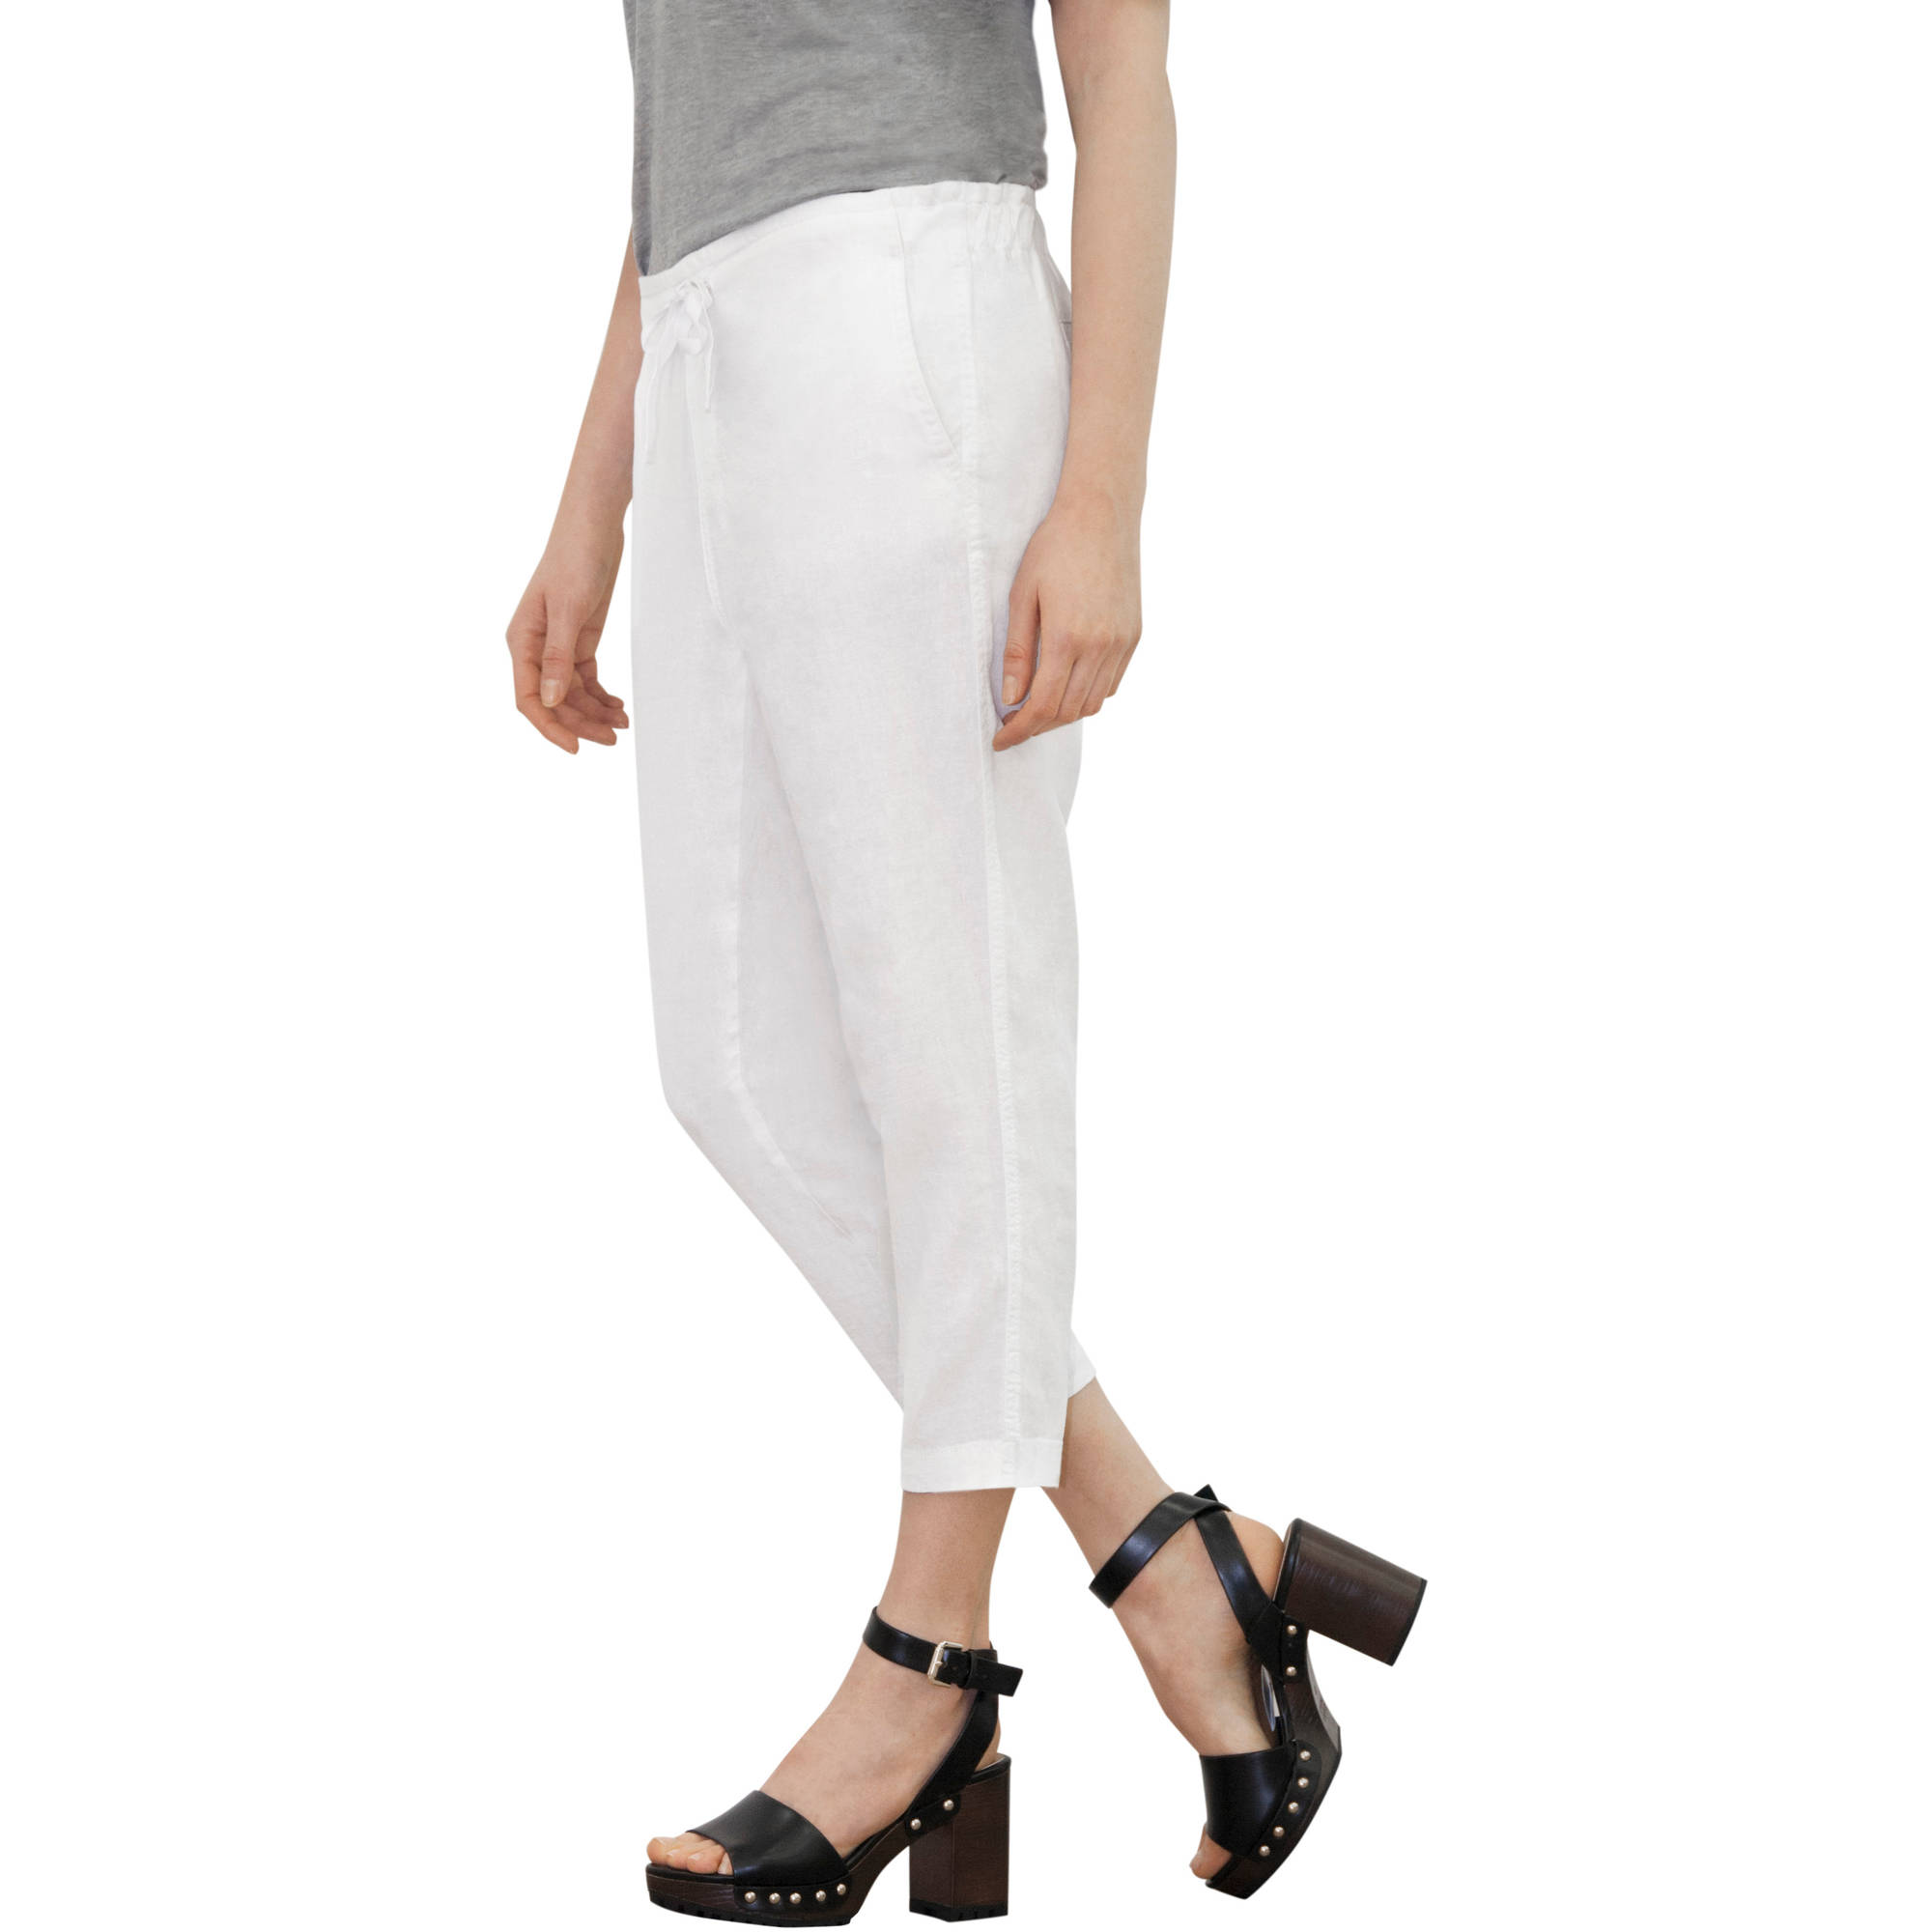 Faded Glory Women's Drawstring Linen Capri Pants - Walmart.com